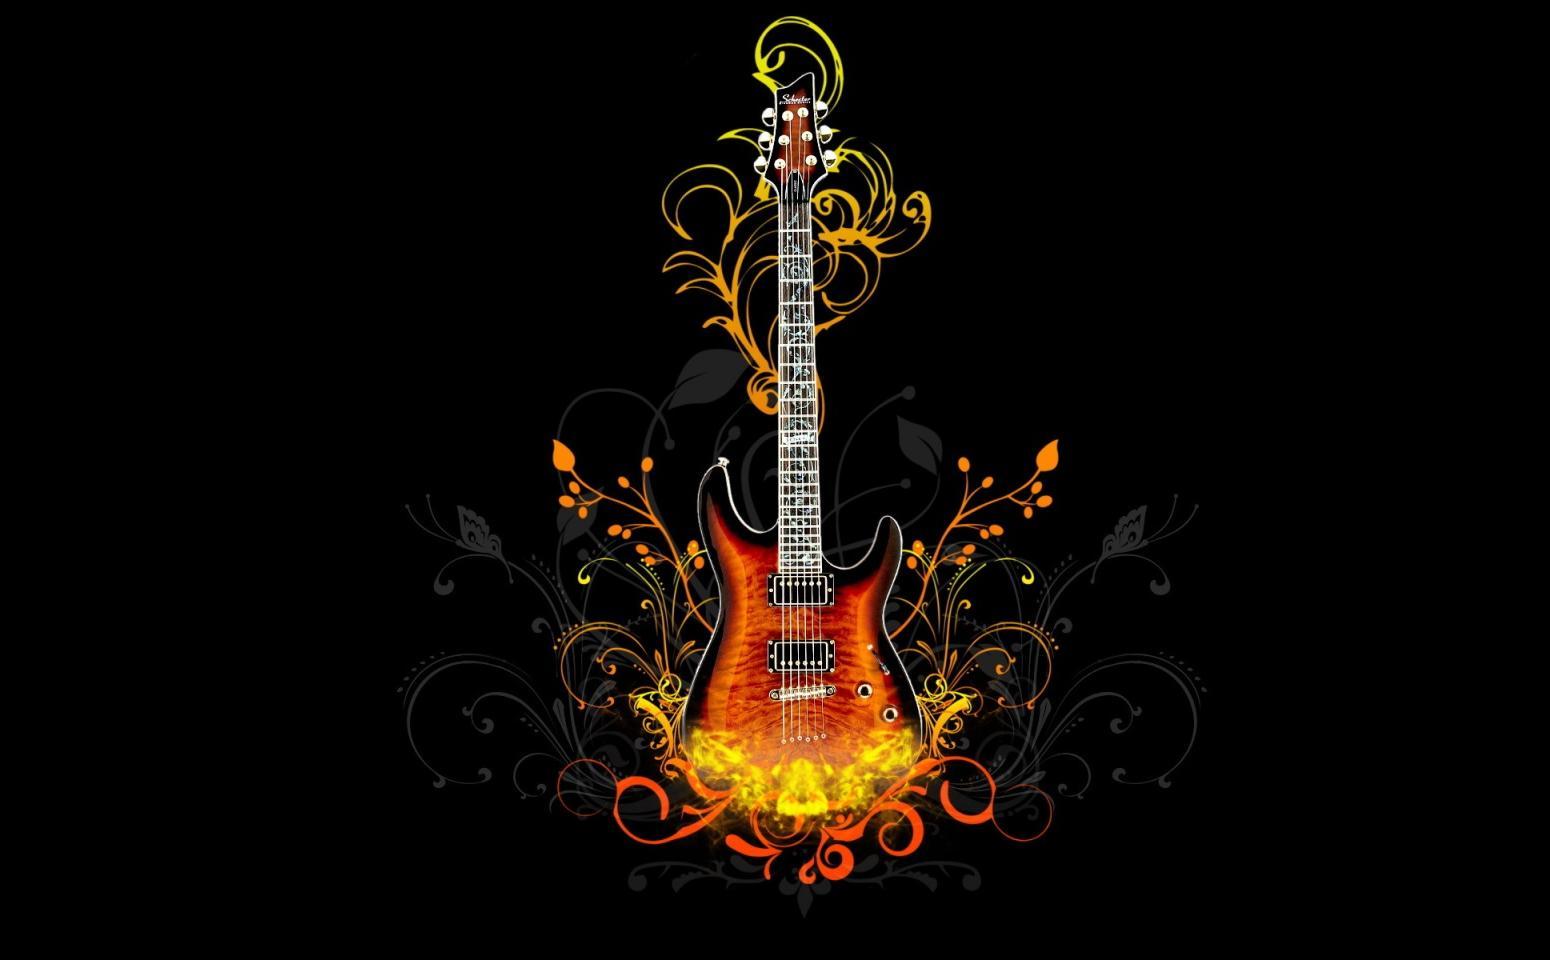 http://3.bp.blogspot.com/_2UbsSBz9ckE/SywflNvQclI/AAAAAAAAApA/kICEhZv1wgc/s1600/Guitar_and_ribbons_1280x960%2Bhd%2Bwallpaper.JPG